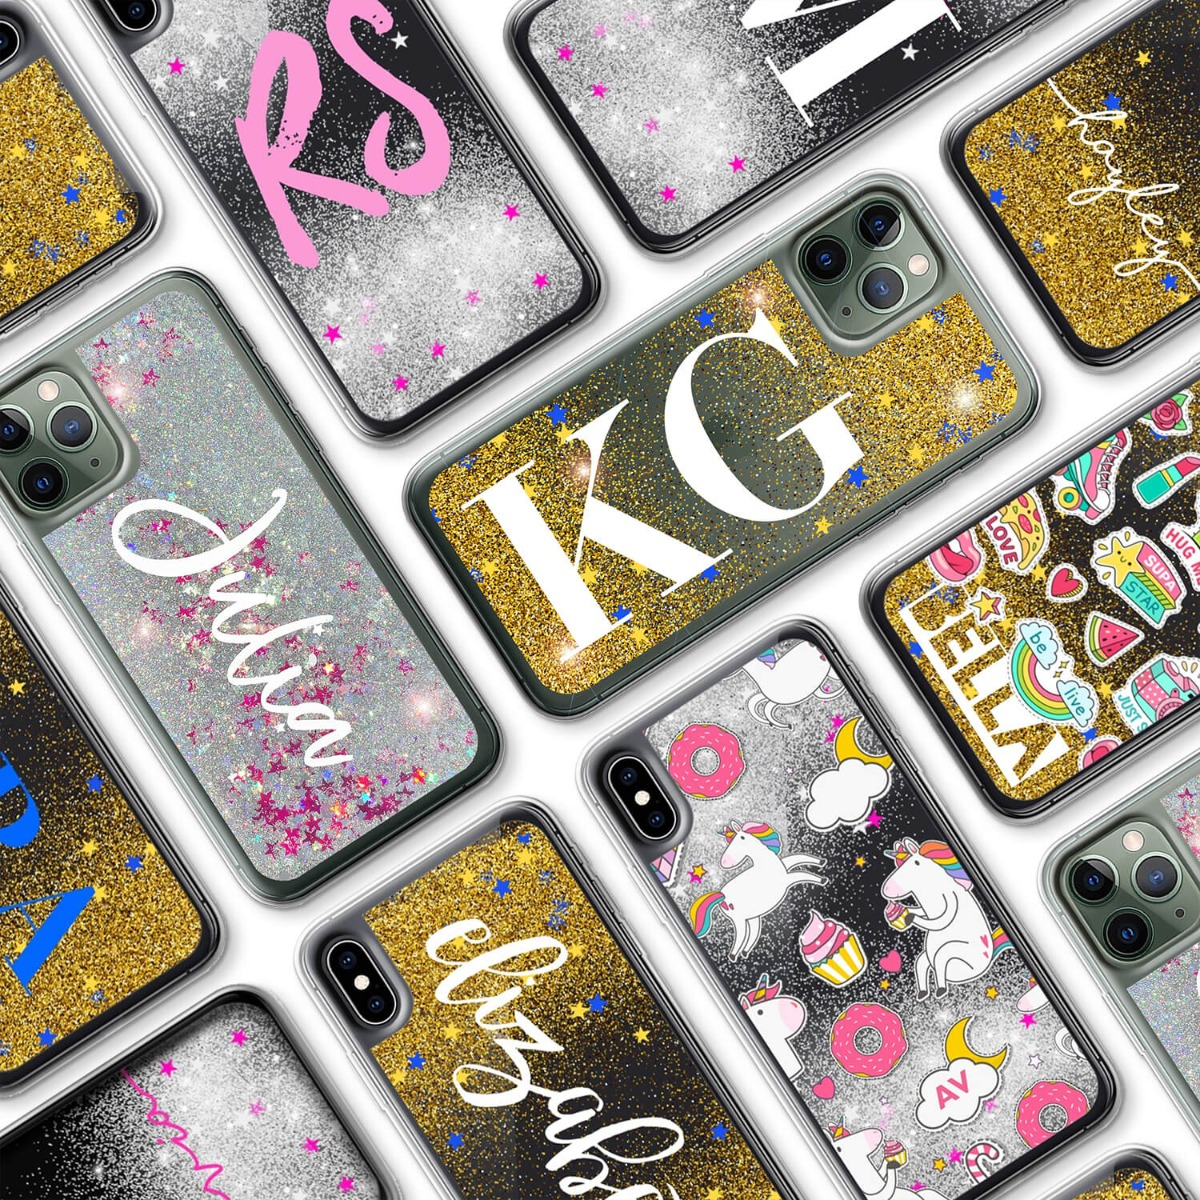 Galaxy S8 Plus Glitter Case 16239